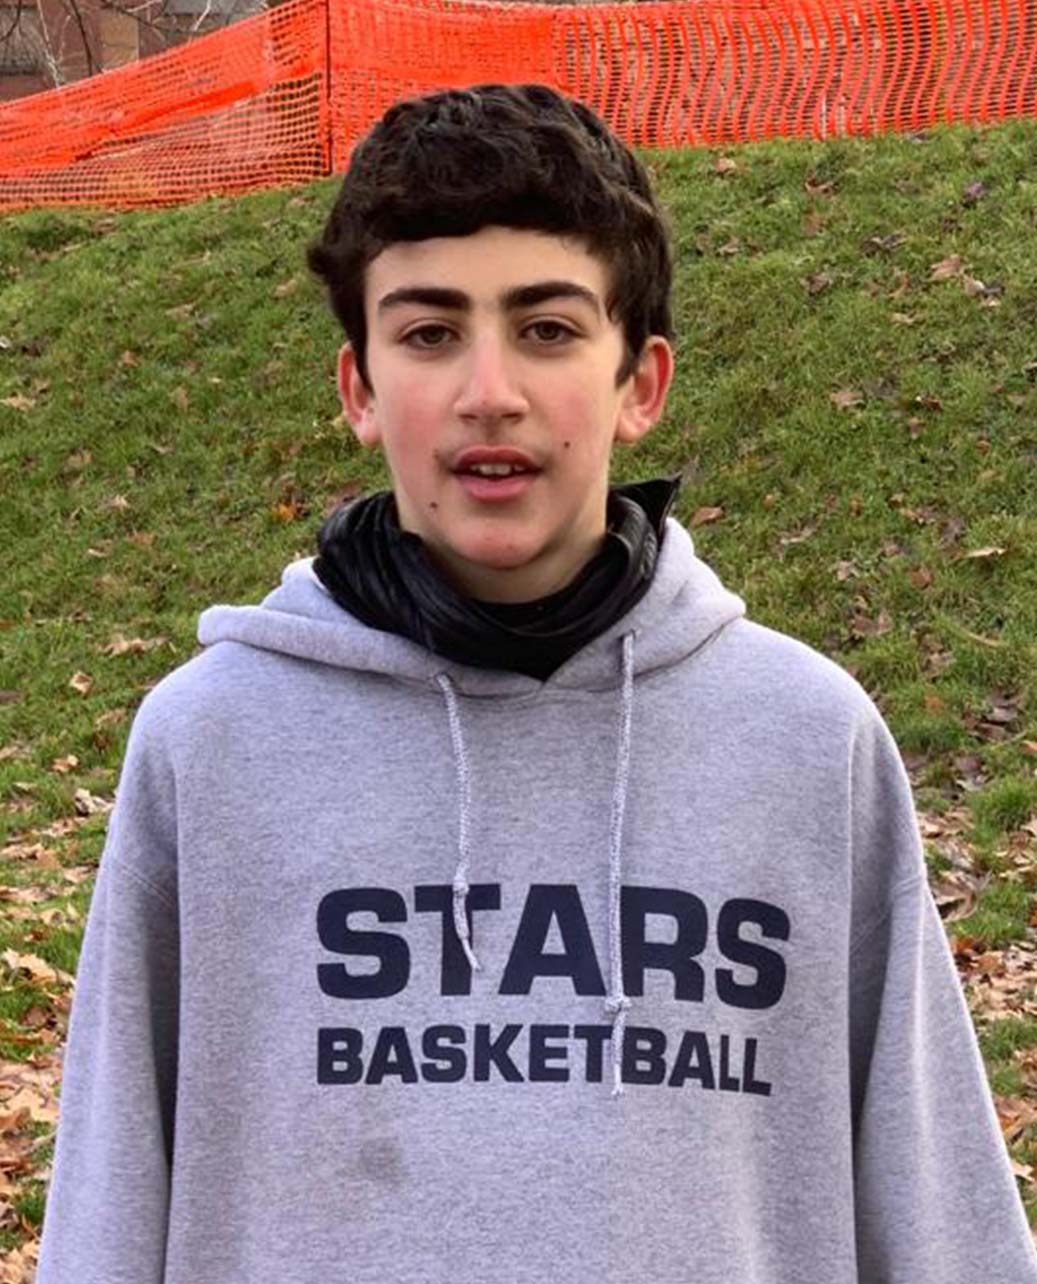 Caroppo Nicholas - Under 15